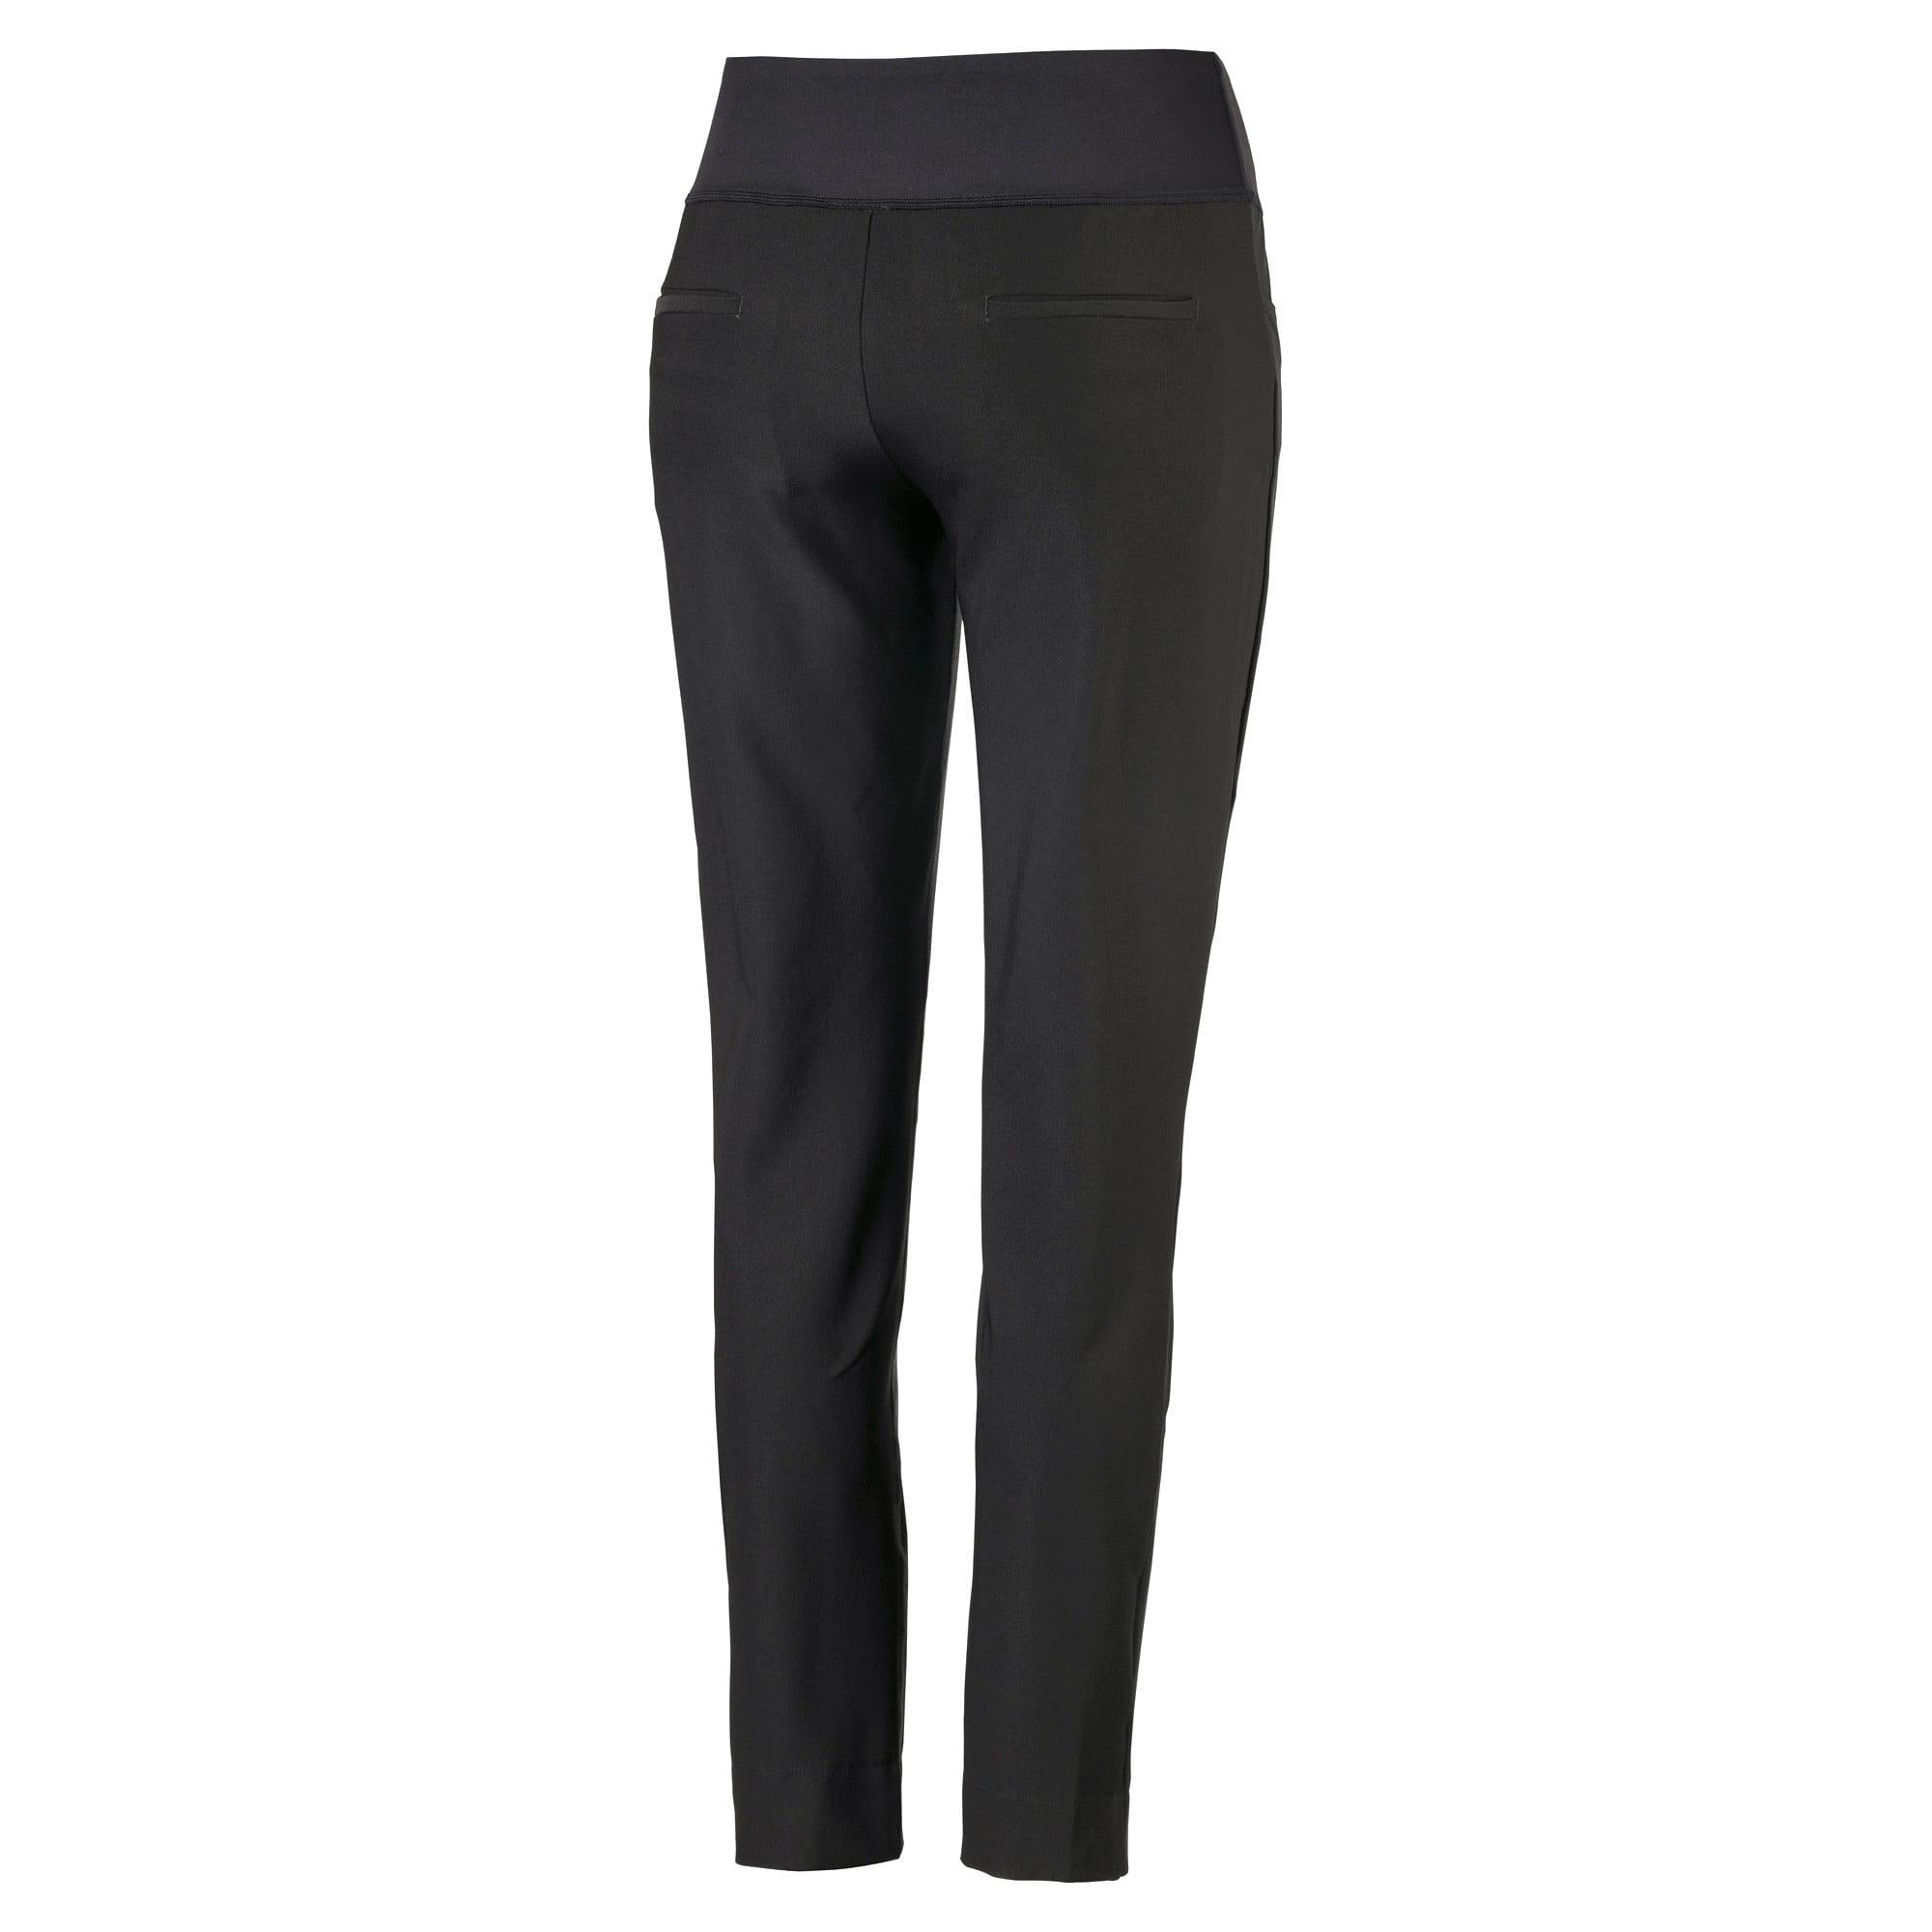 Thumbnail 5 of Golf Women's PWRSHAPE Pull On Pants, Puma Black, medium